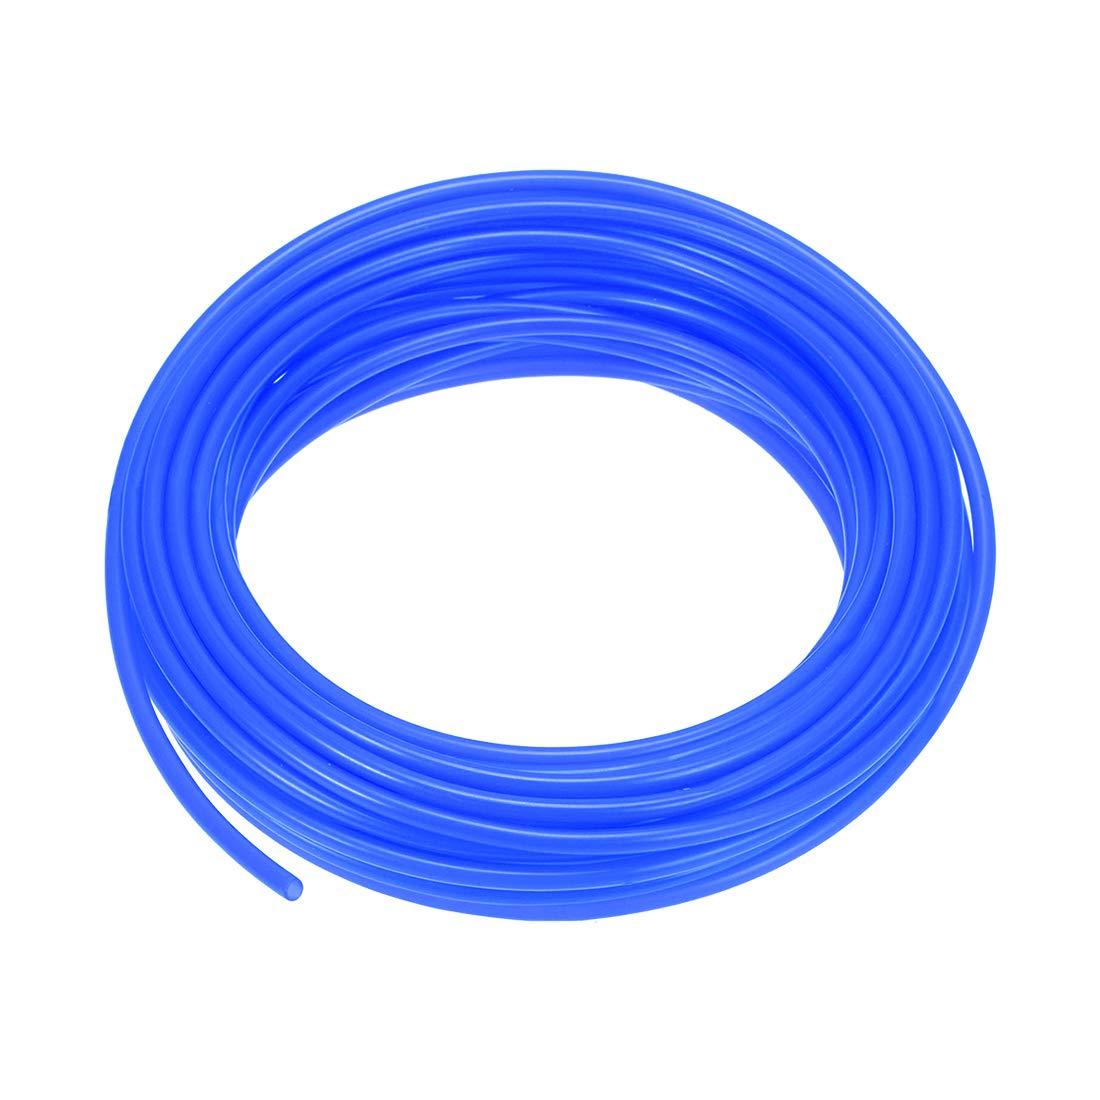 Blue 3//16 Inch ID x 1//4 Inch OD 32.8 Feet Length uxcell PE Plastic Tubing